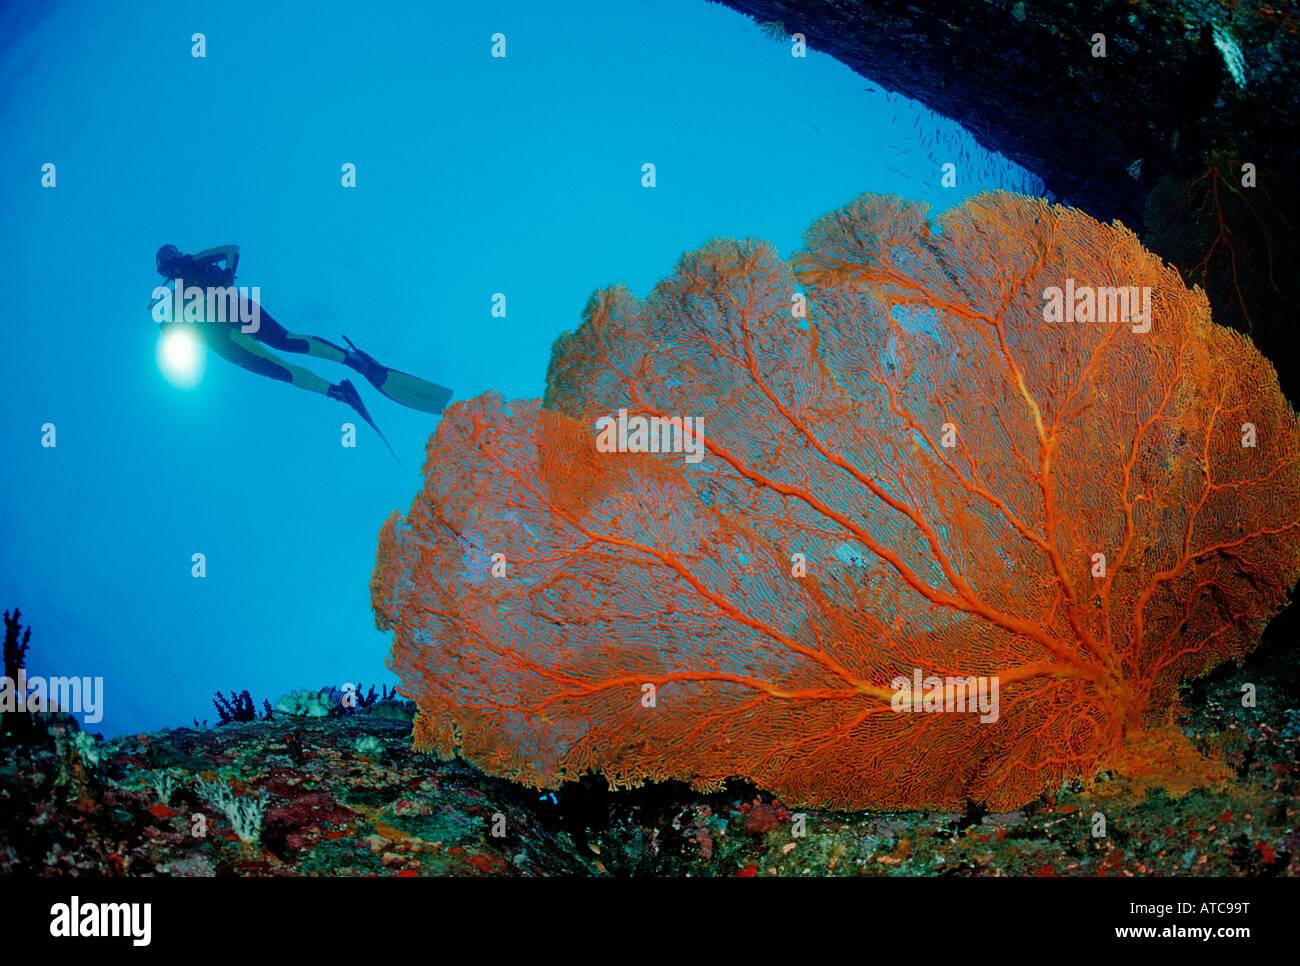 Taucher und Red Sea Fan Similan Inseln-Thailand Stockfoto